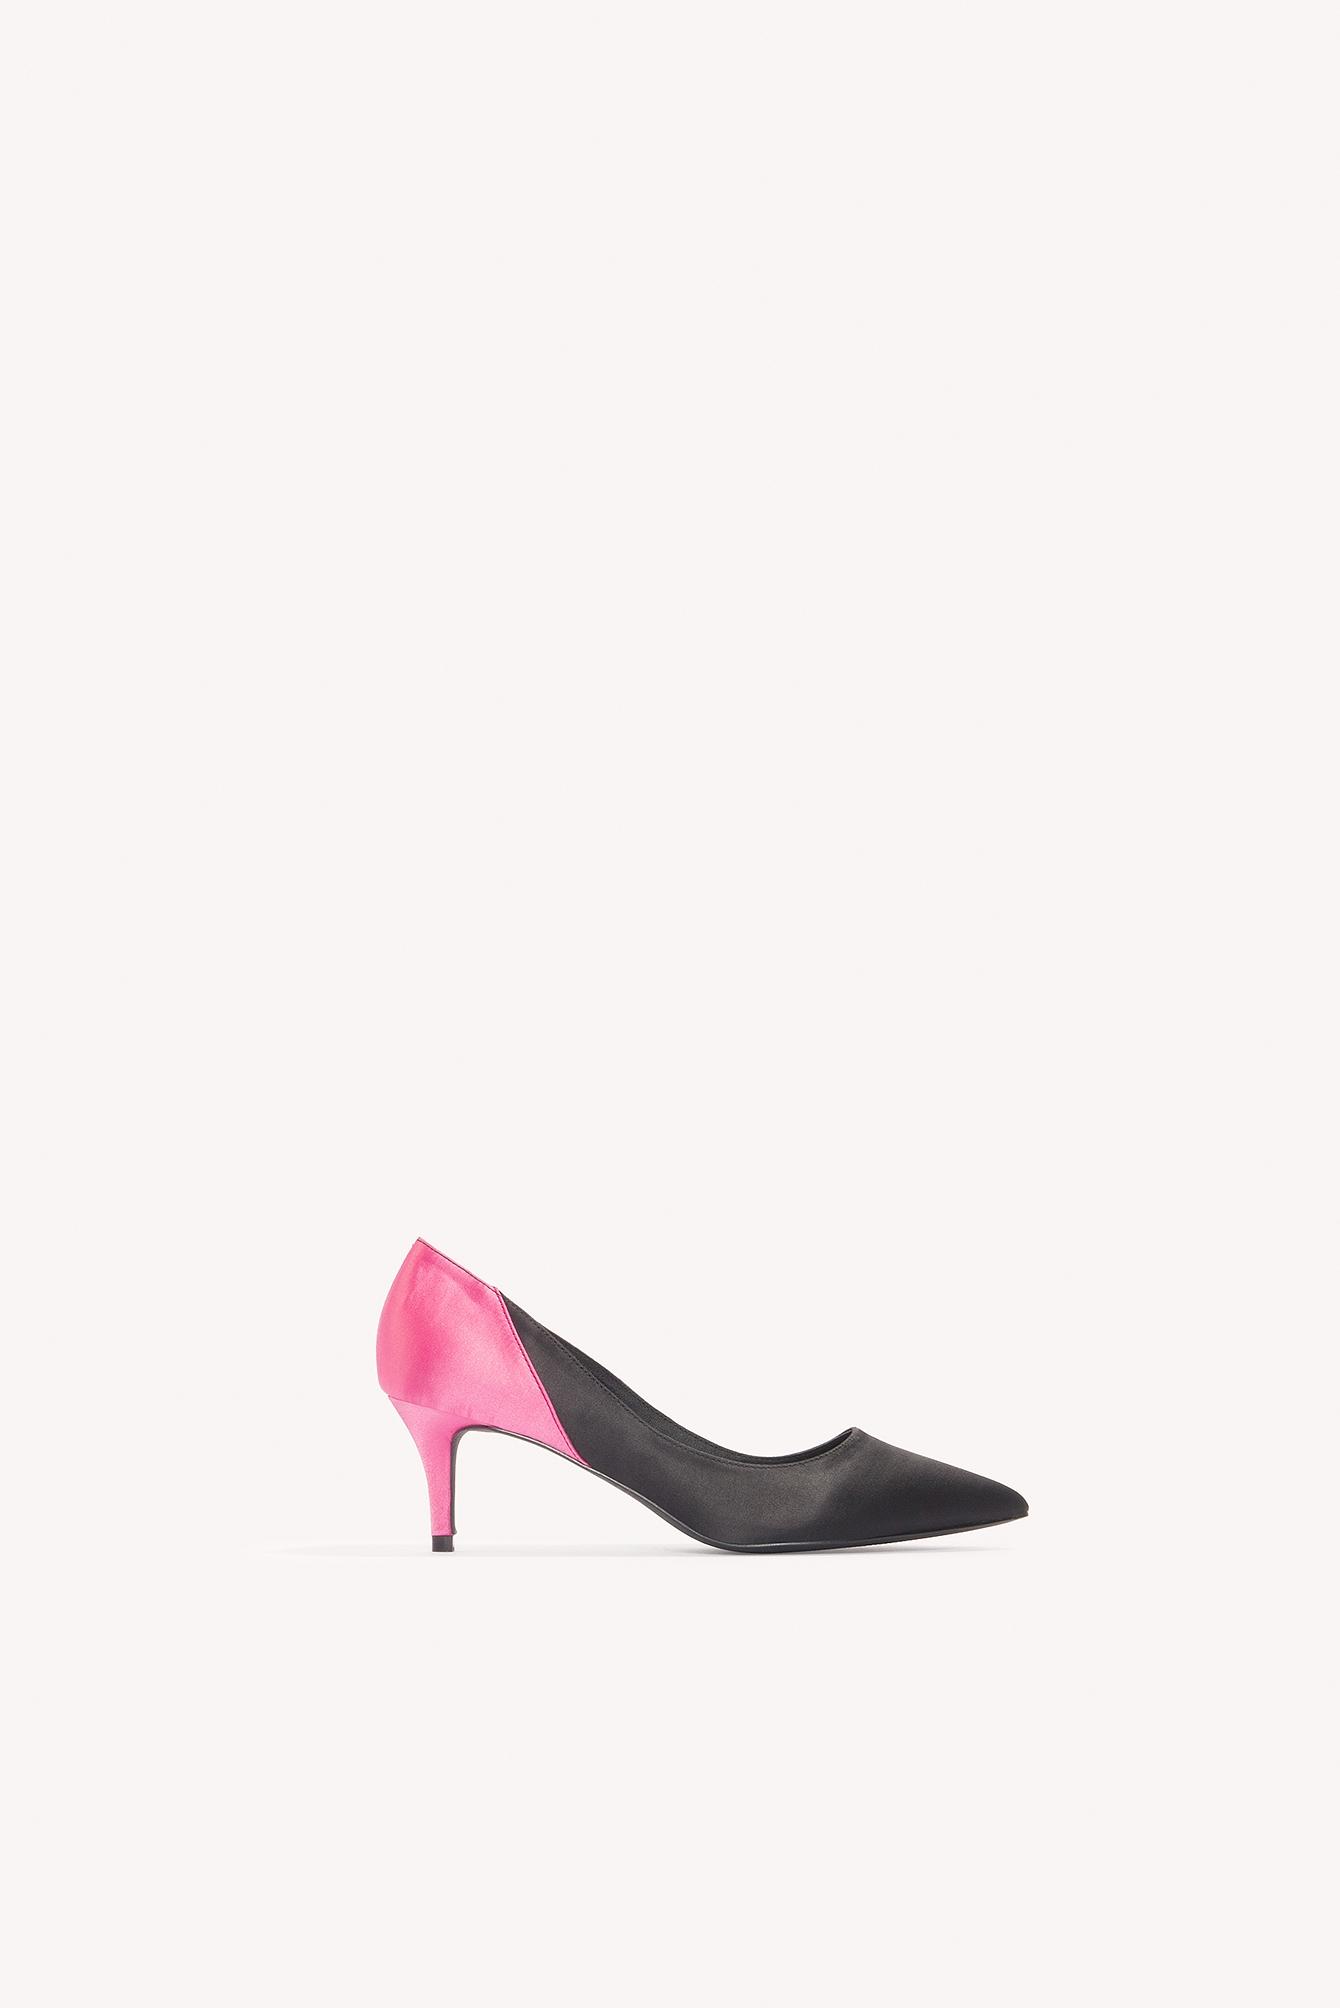 47314c94d9 Image of NA-KD Shoes Block Mid Heel Satin Pumps - Black, Multicolor